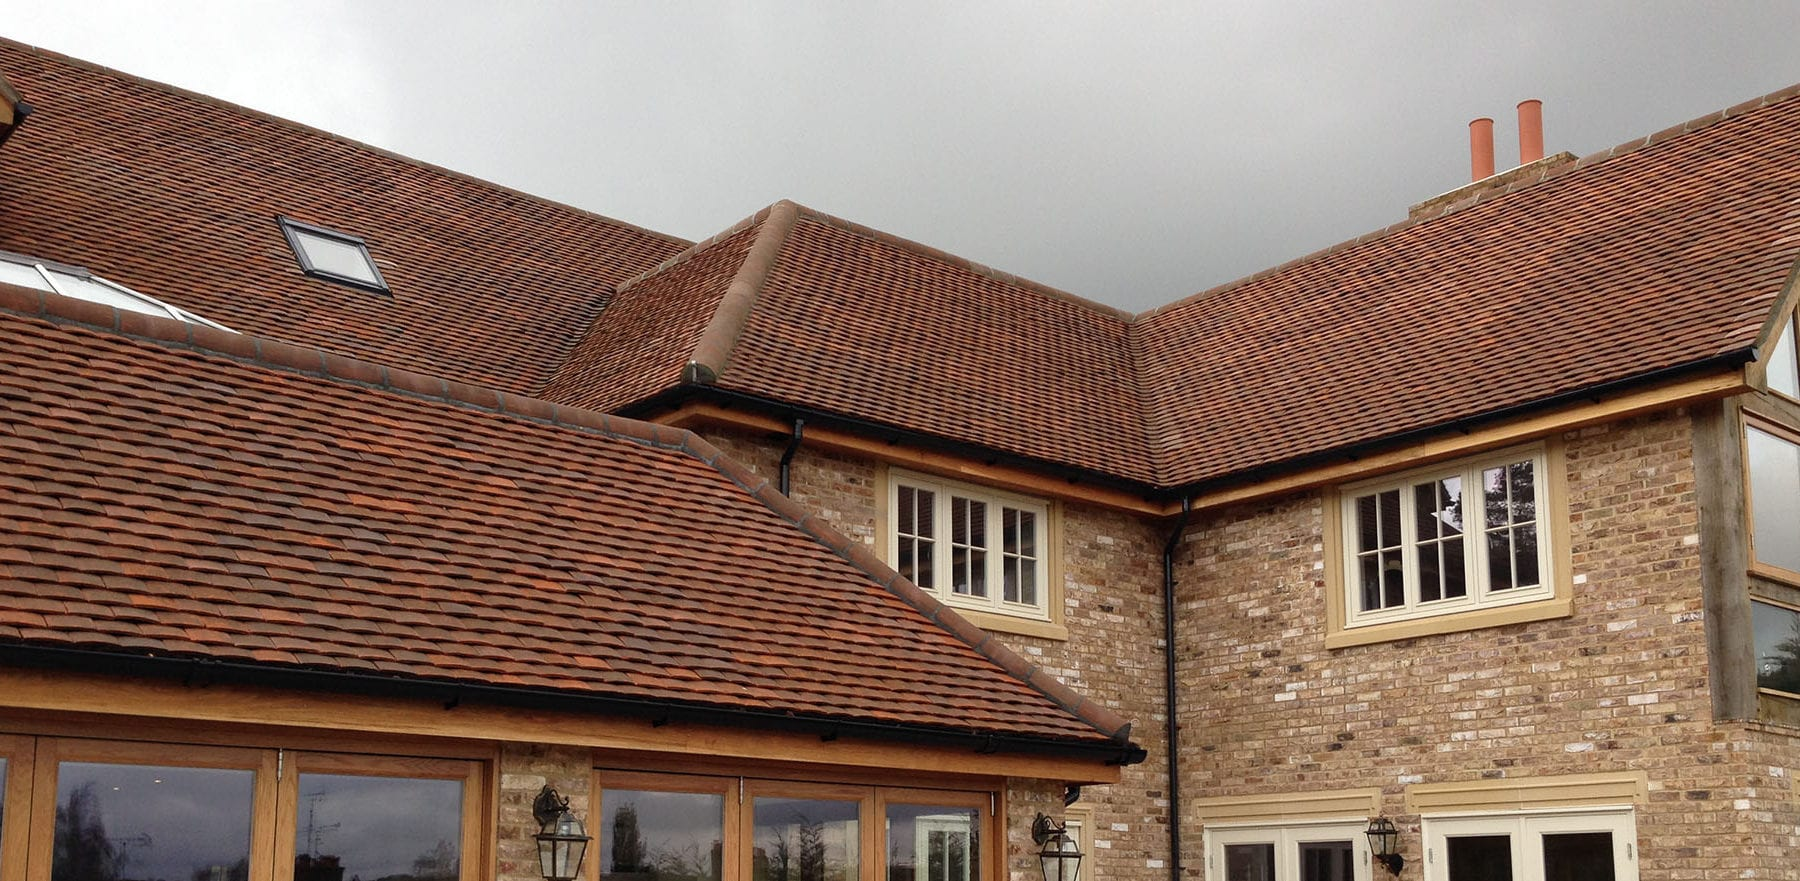 Lifestiles - Handmade Brown Clay Roof Tiles - Sunningdale, England 5